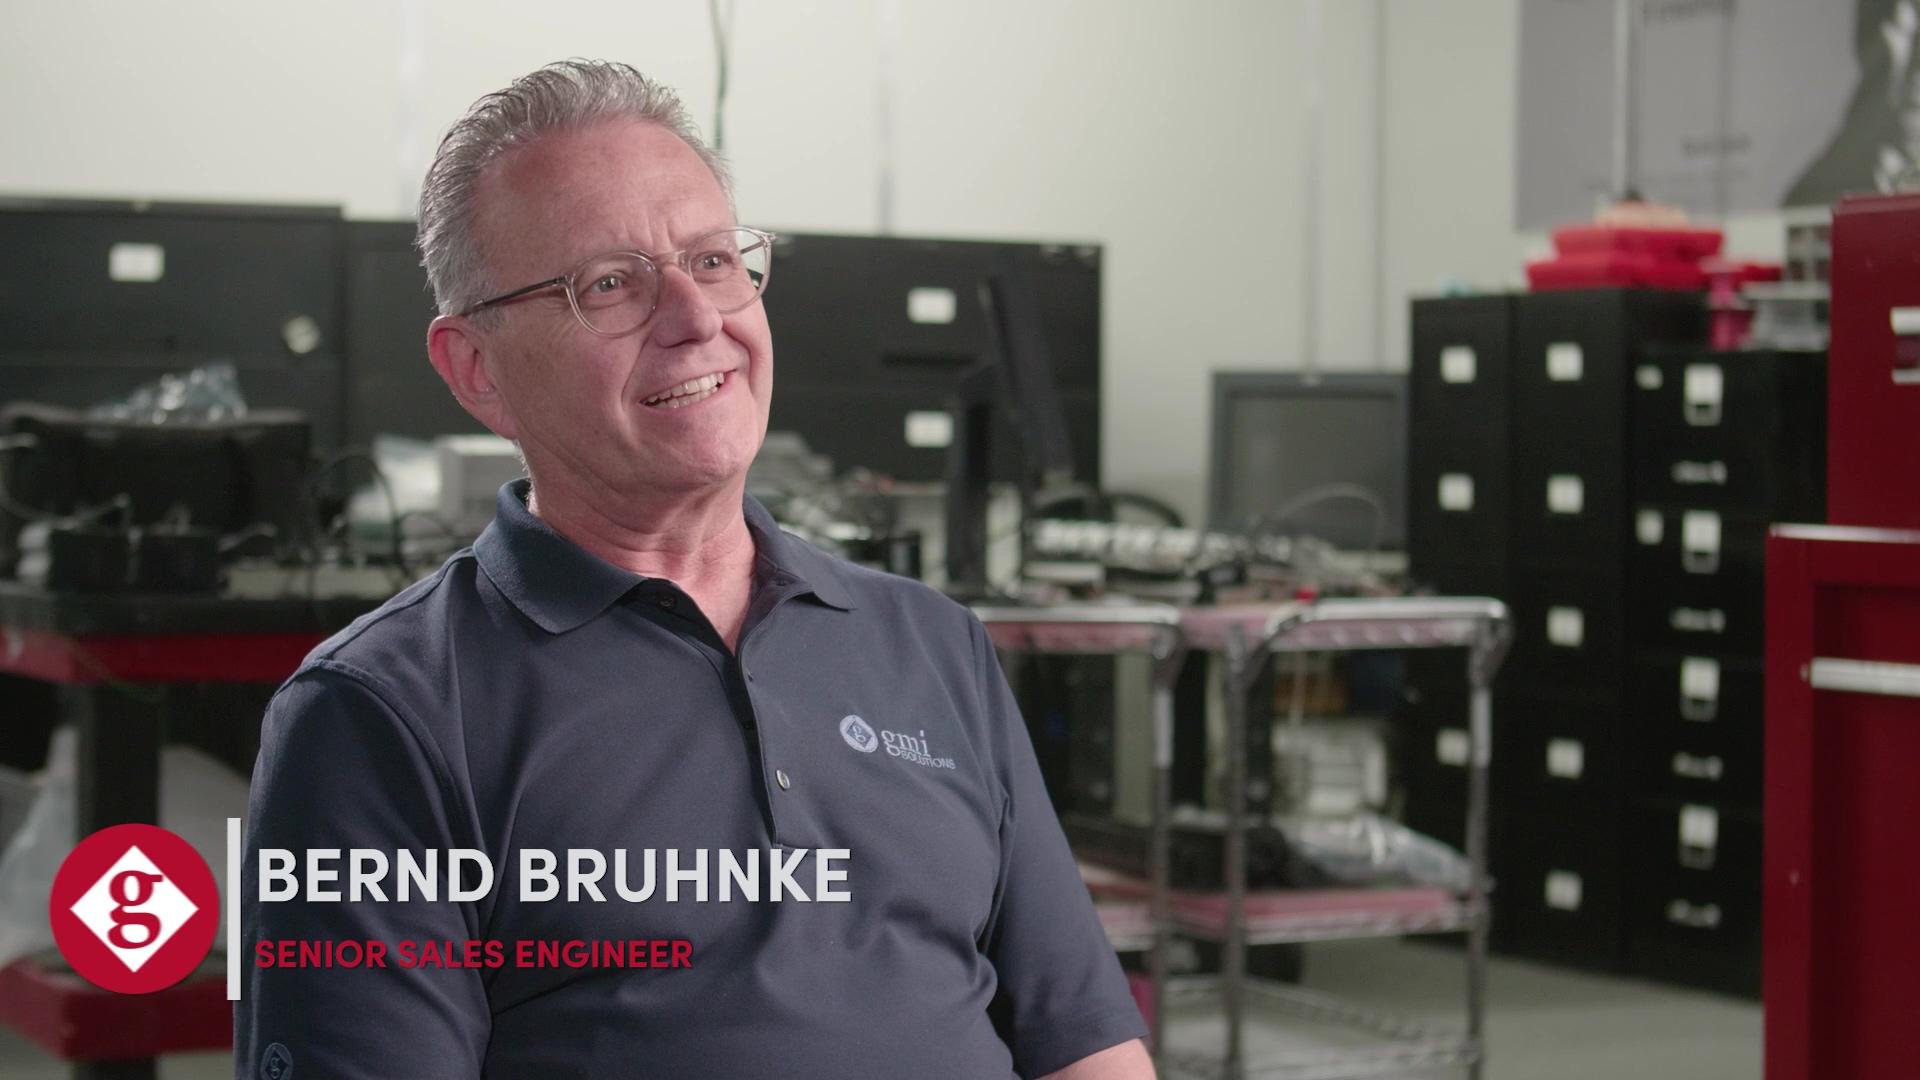 Meet_Bernd_Bruhnke